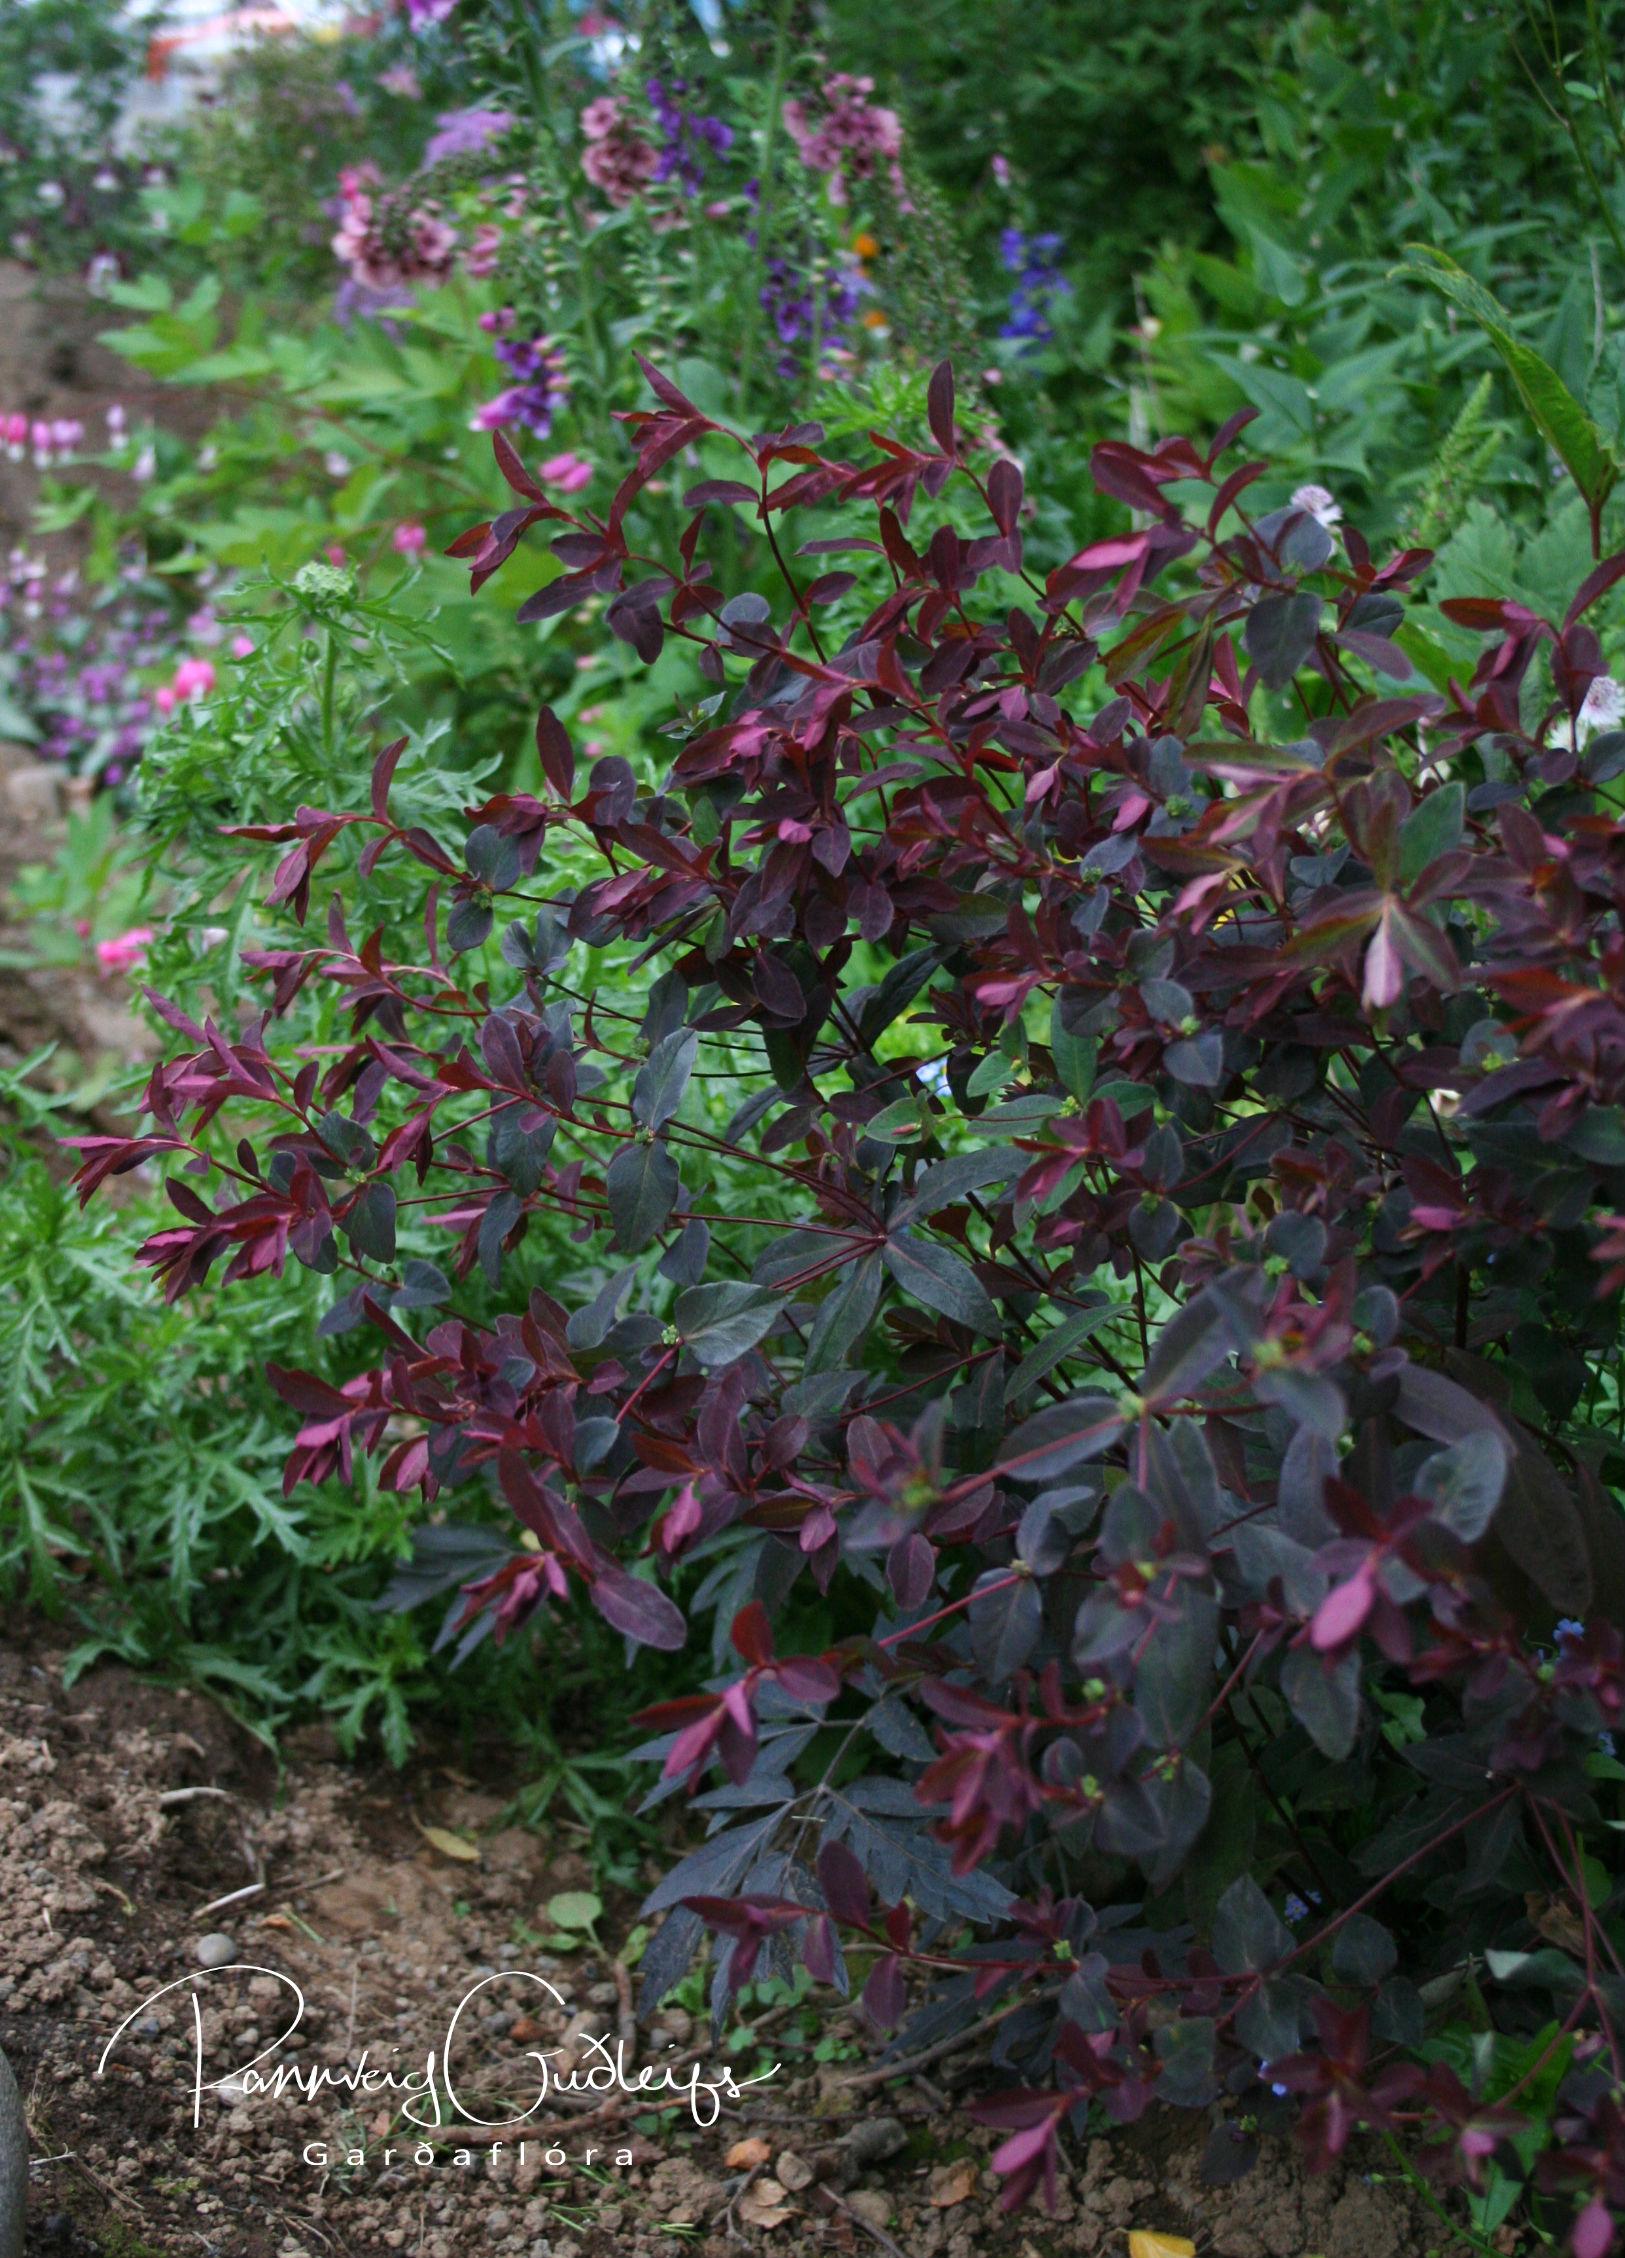 Euphorbia dulcis 'Chamaeleon'